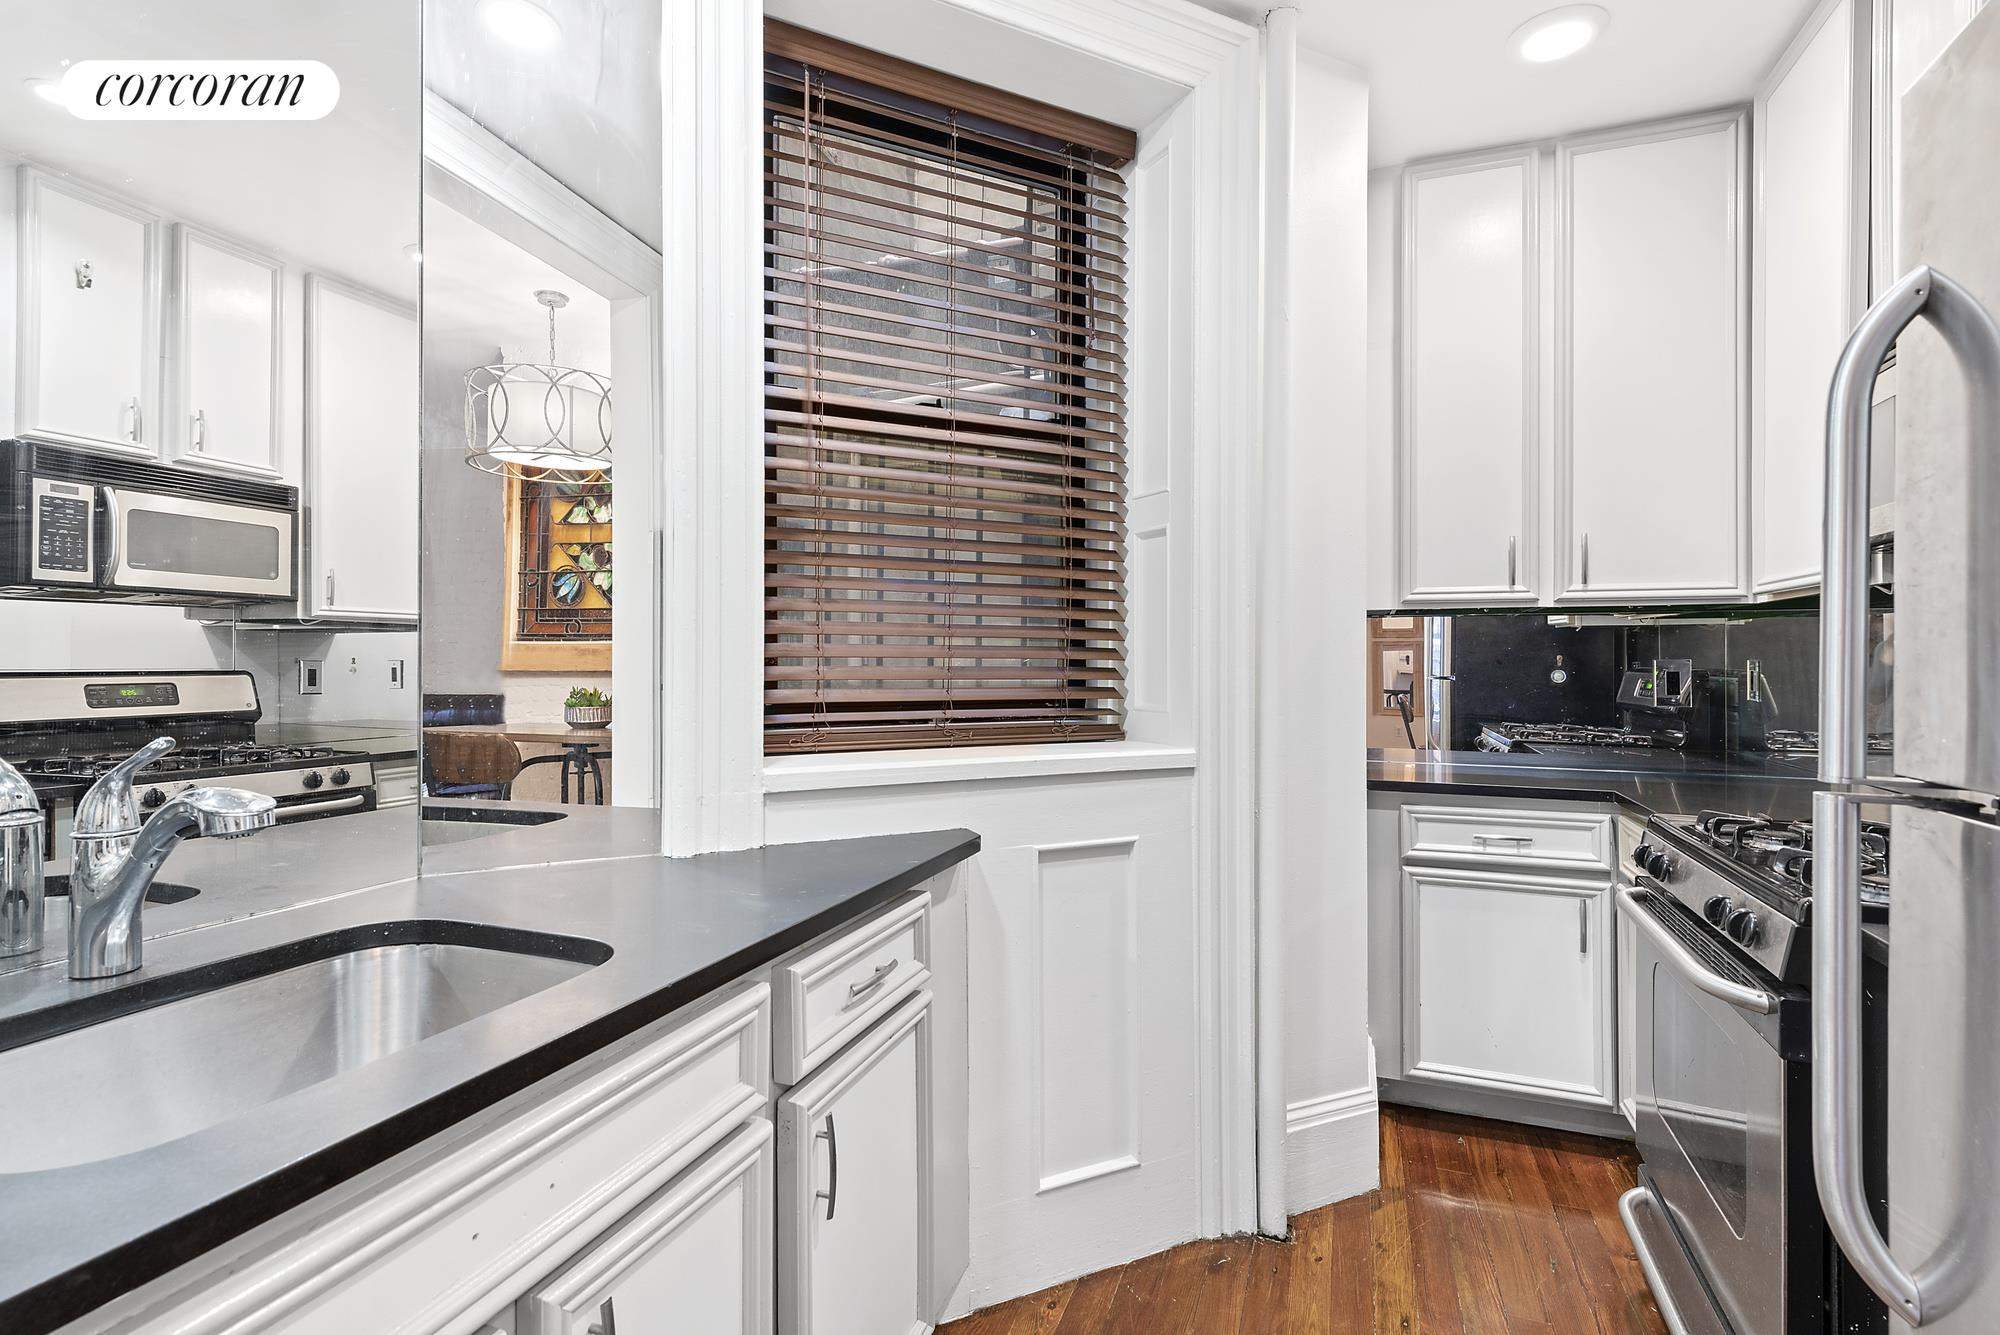 Apartment for sale at 98 Avenue C, Apt 1A